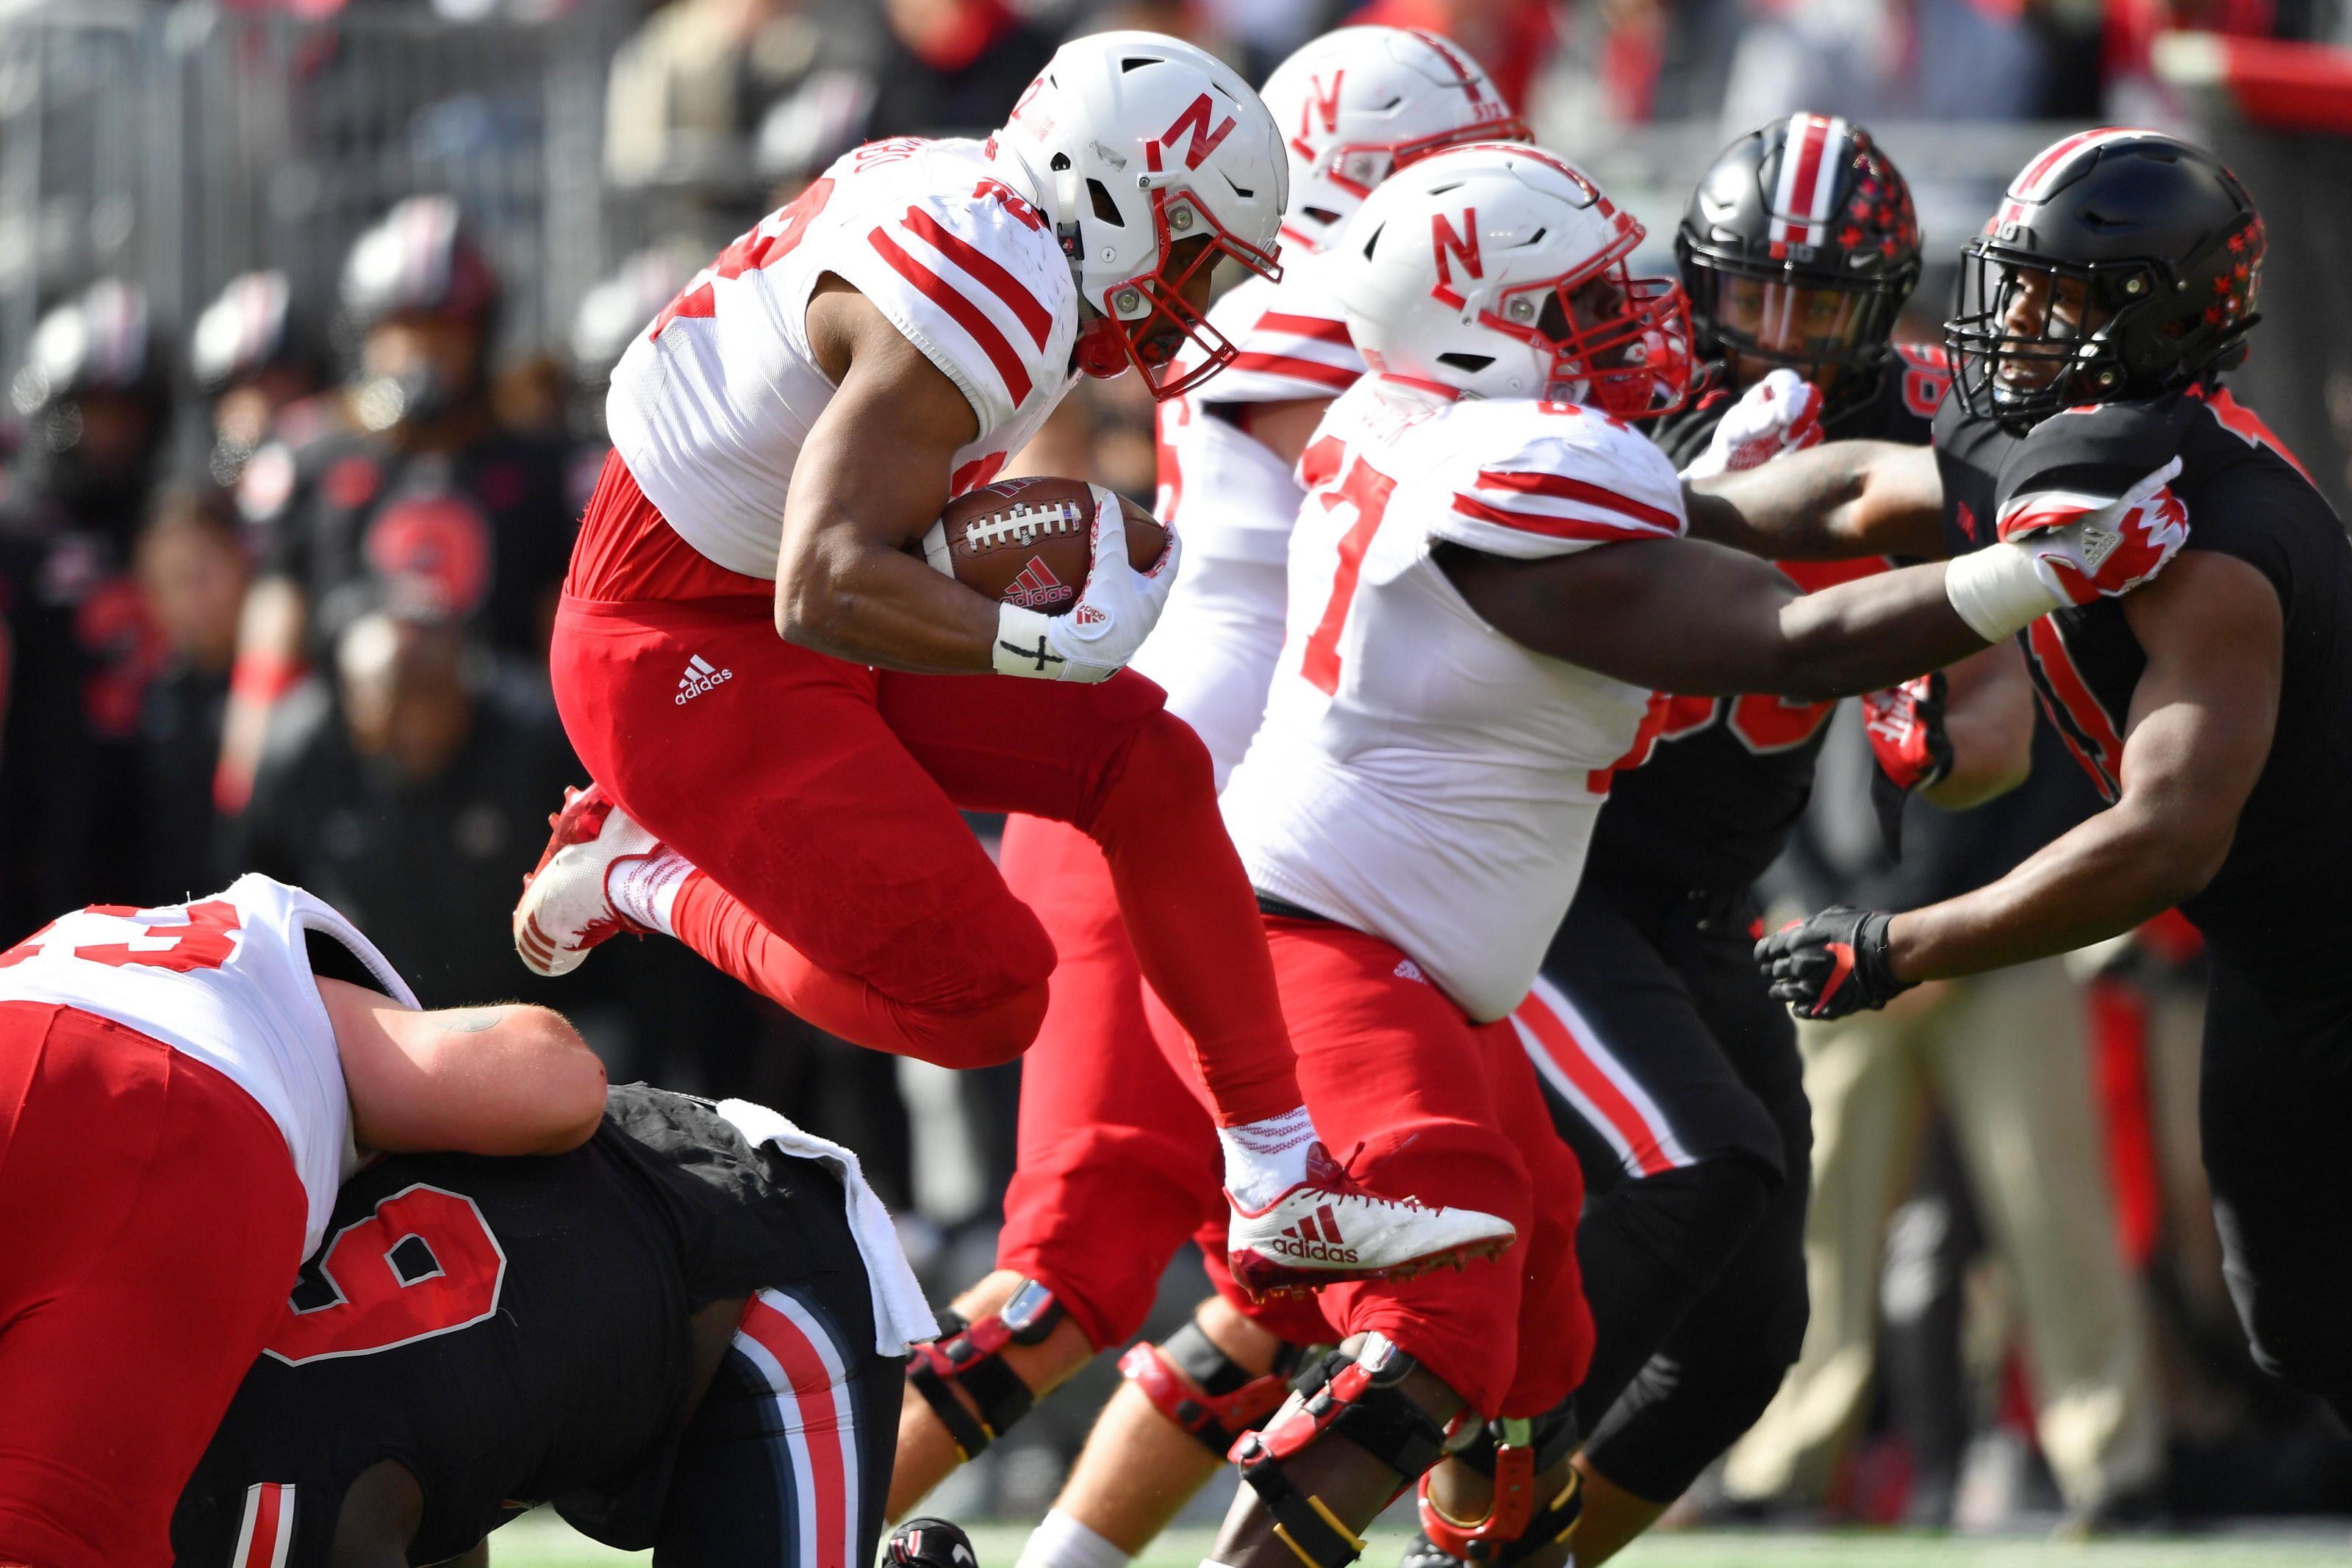 Nebraska Football 3 Key Takeaways From Huskers Loss To Ohio State